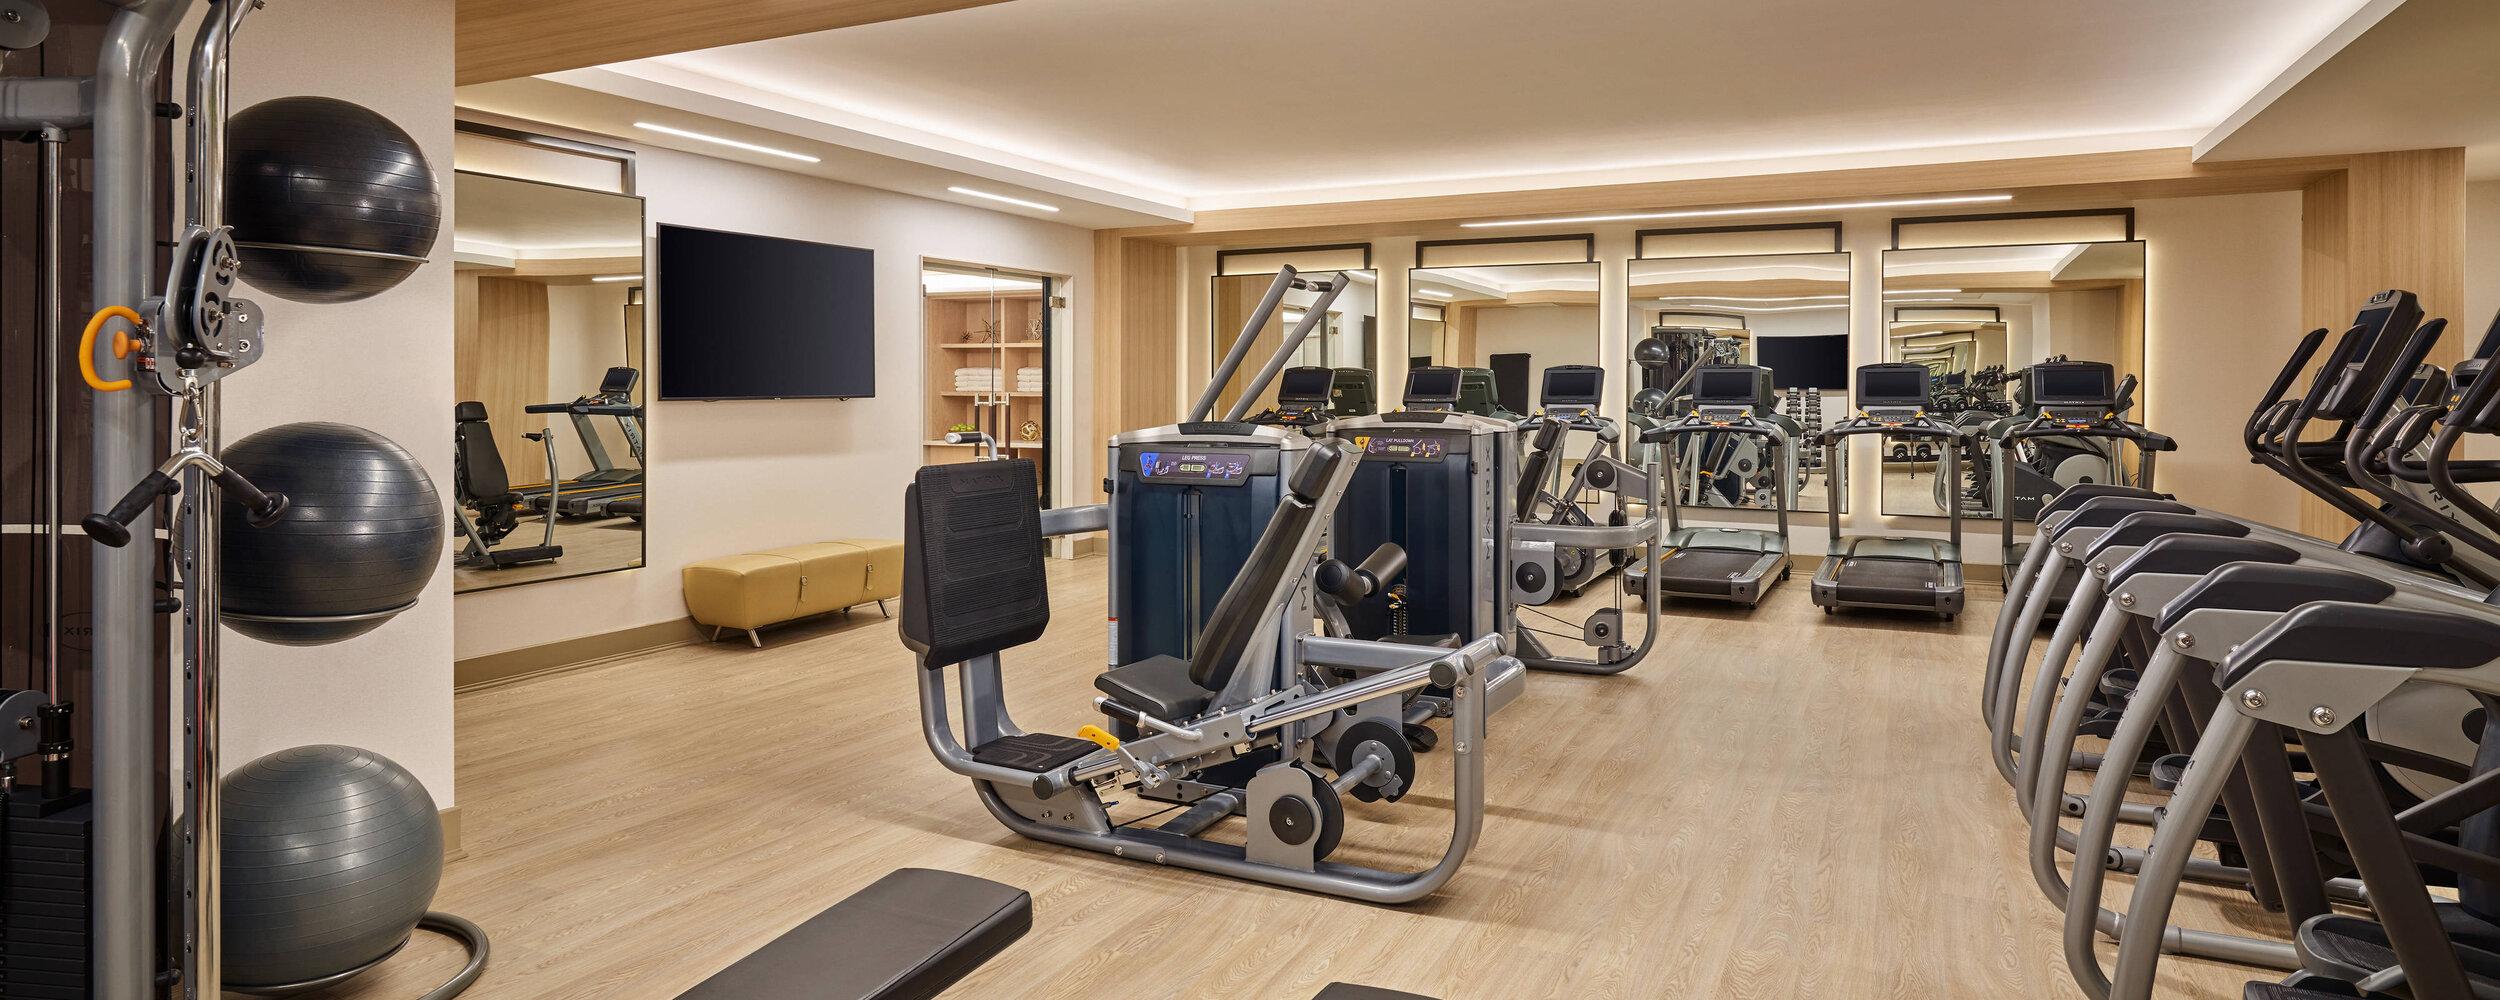 denjw-fitness-5393-hor-feat.jpg